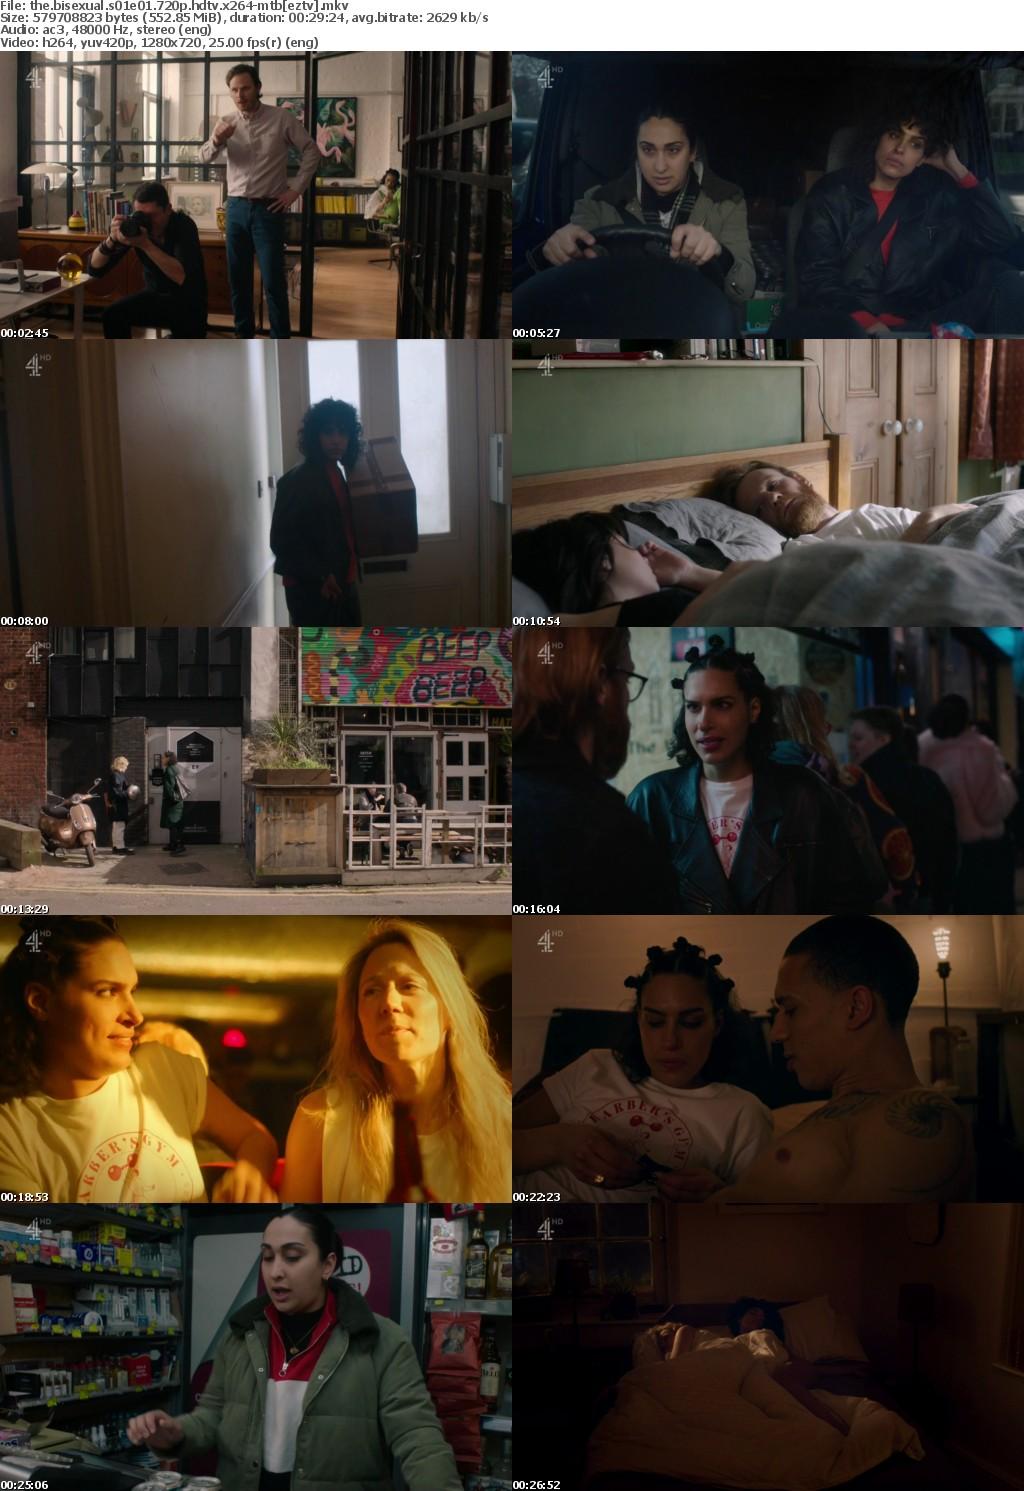 The Bisexual S01E01 720p HDTV x264-MTB